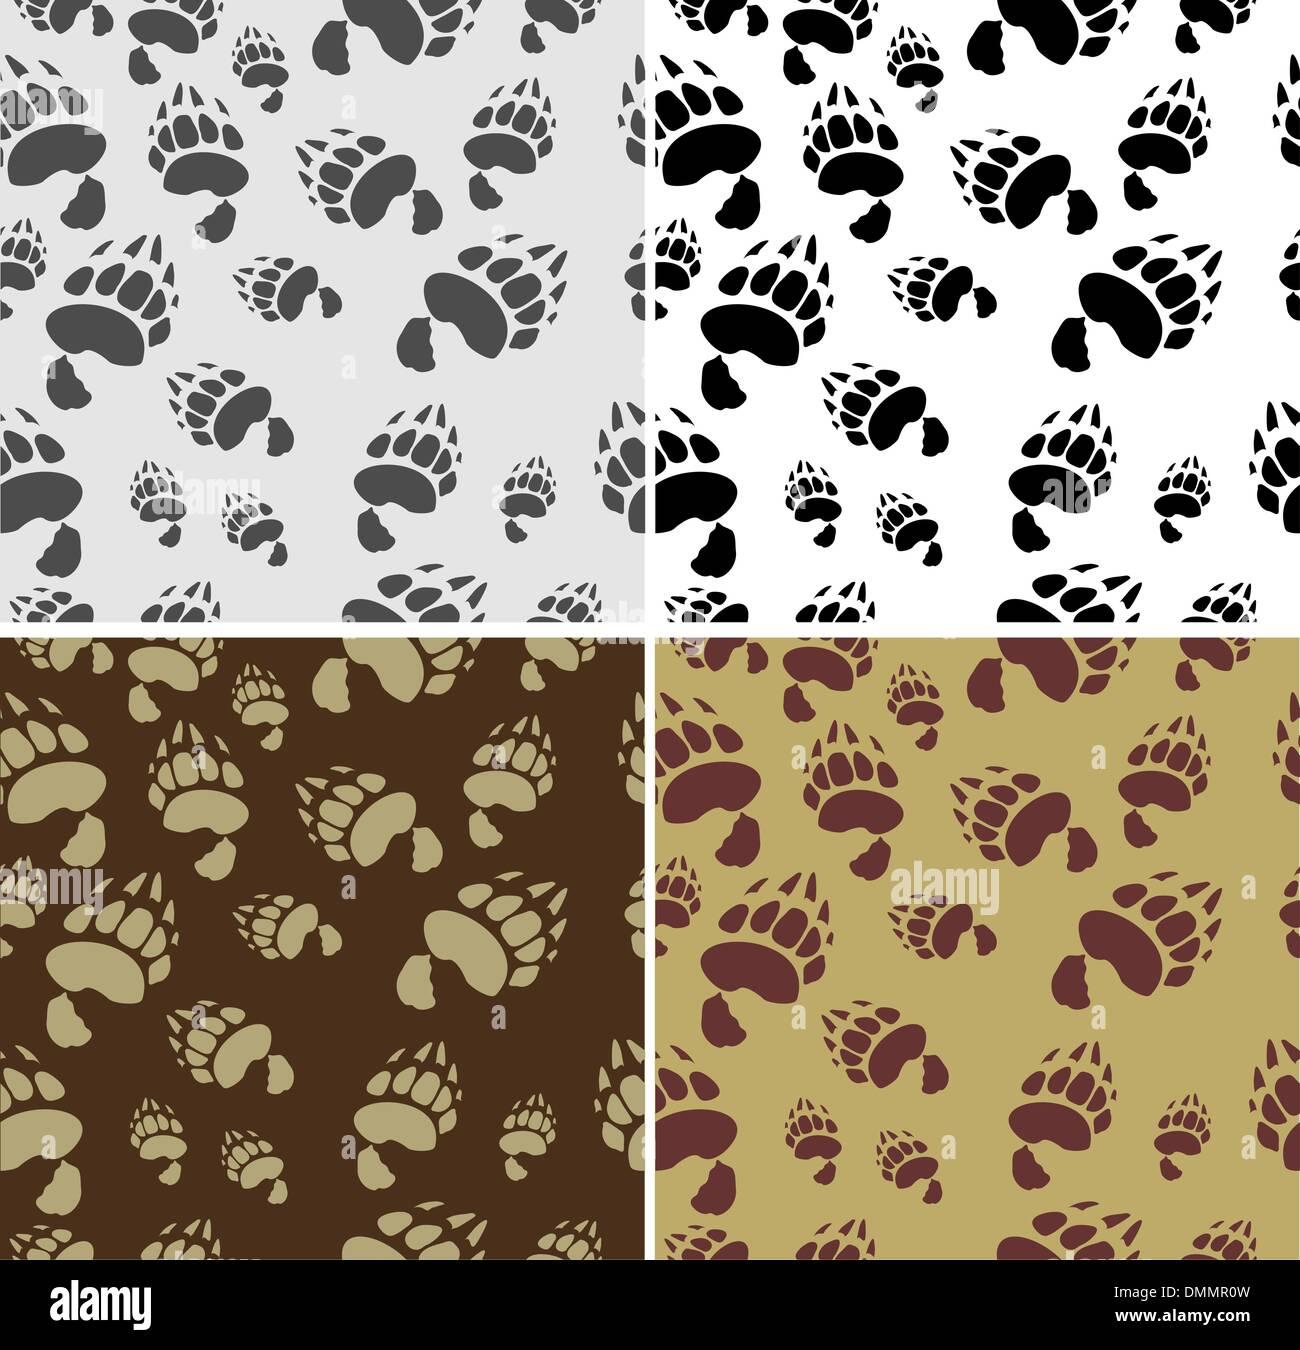 Bear tracks Seamless Texture - Stock Image